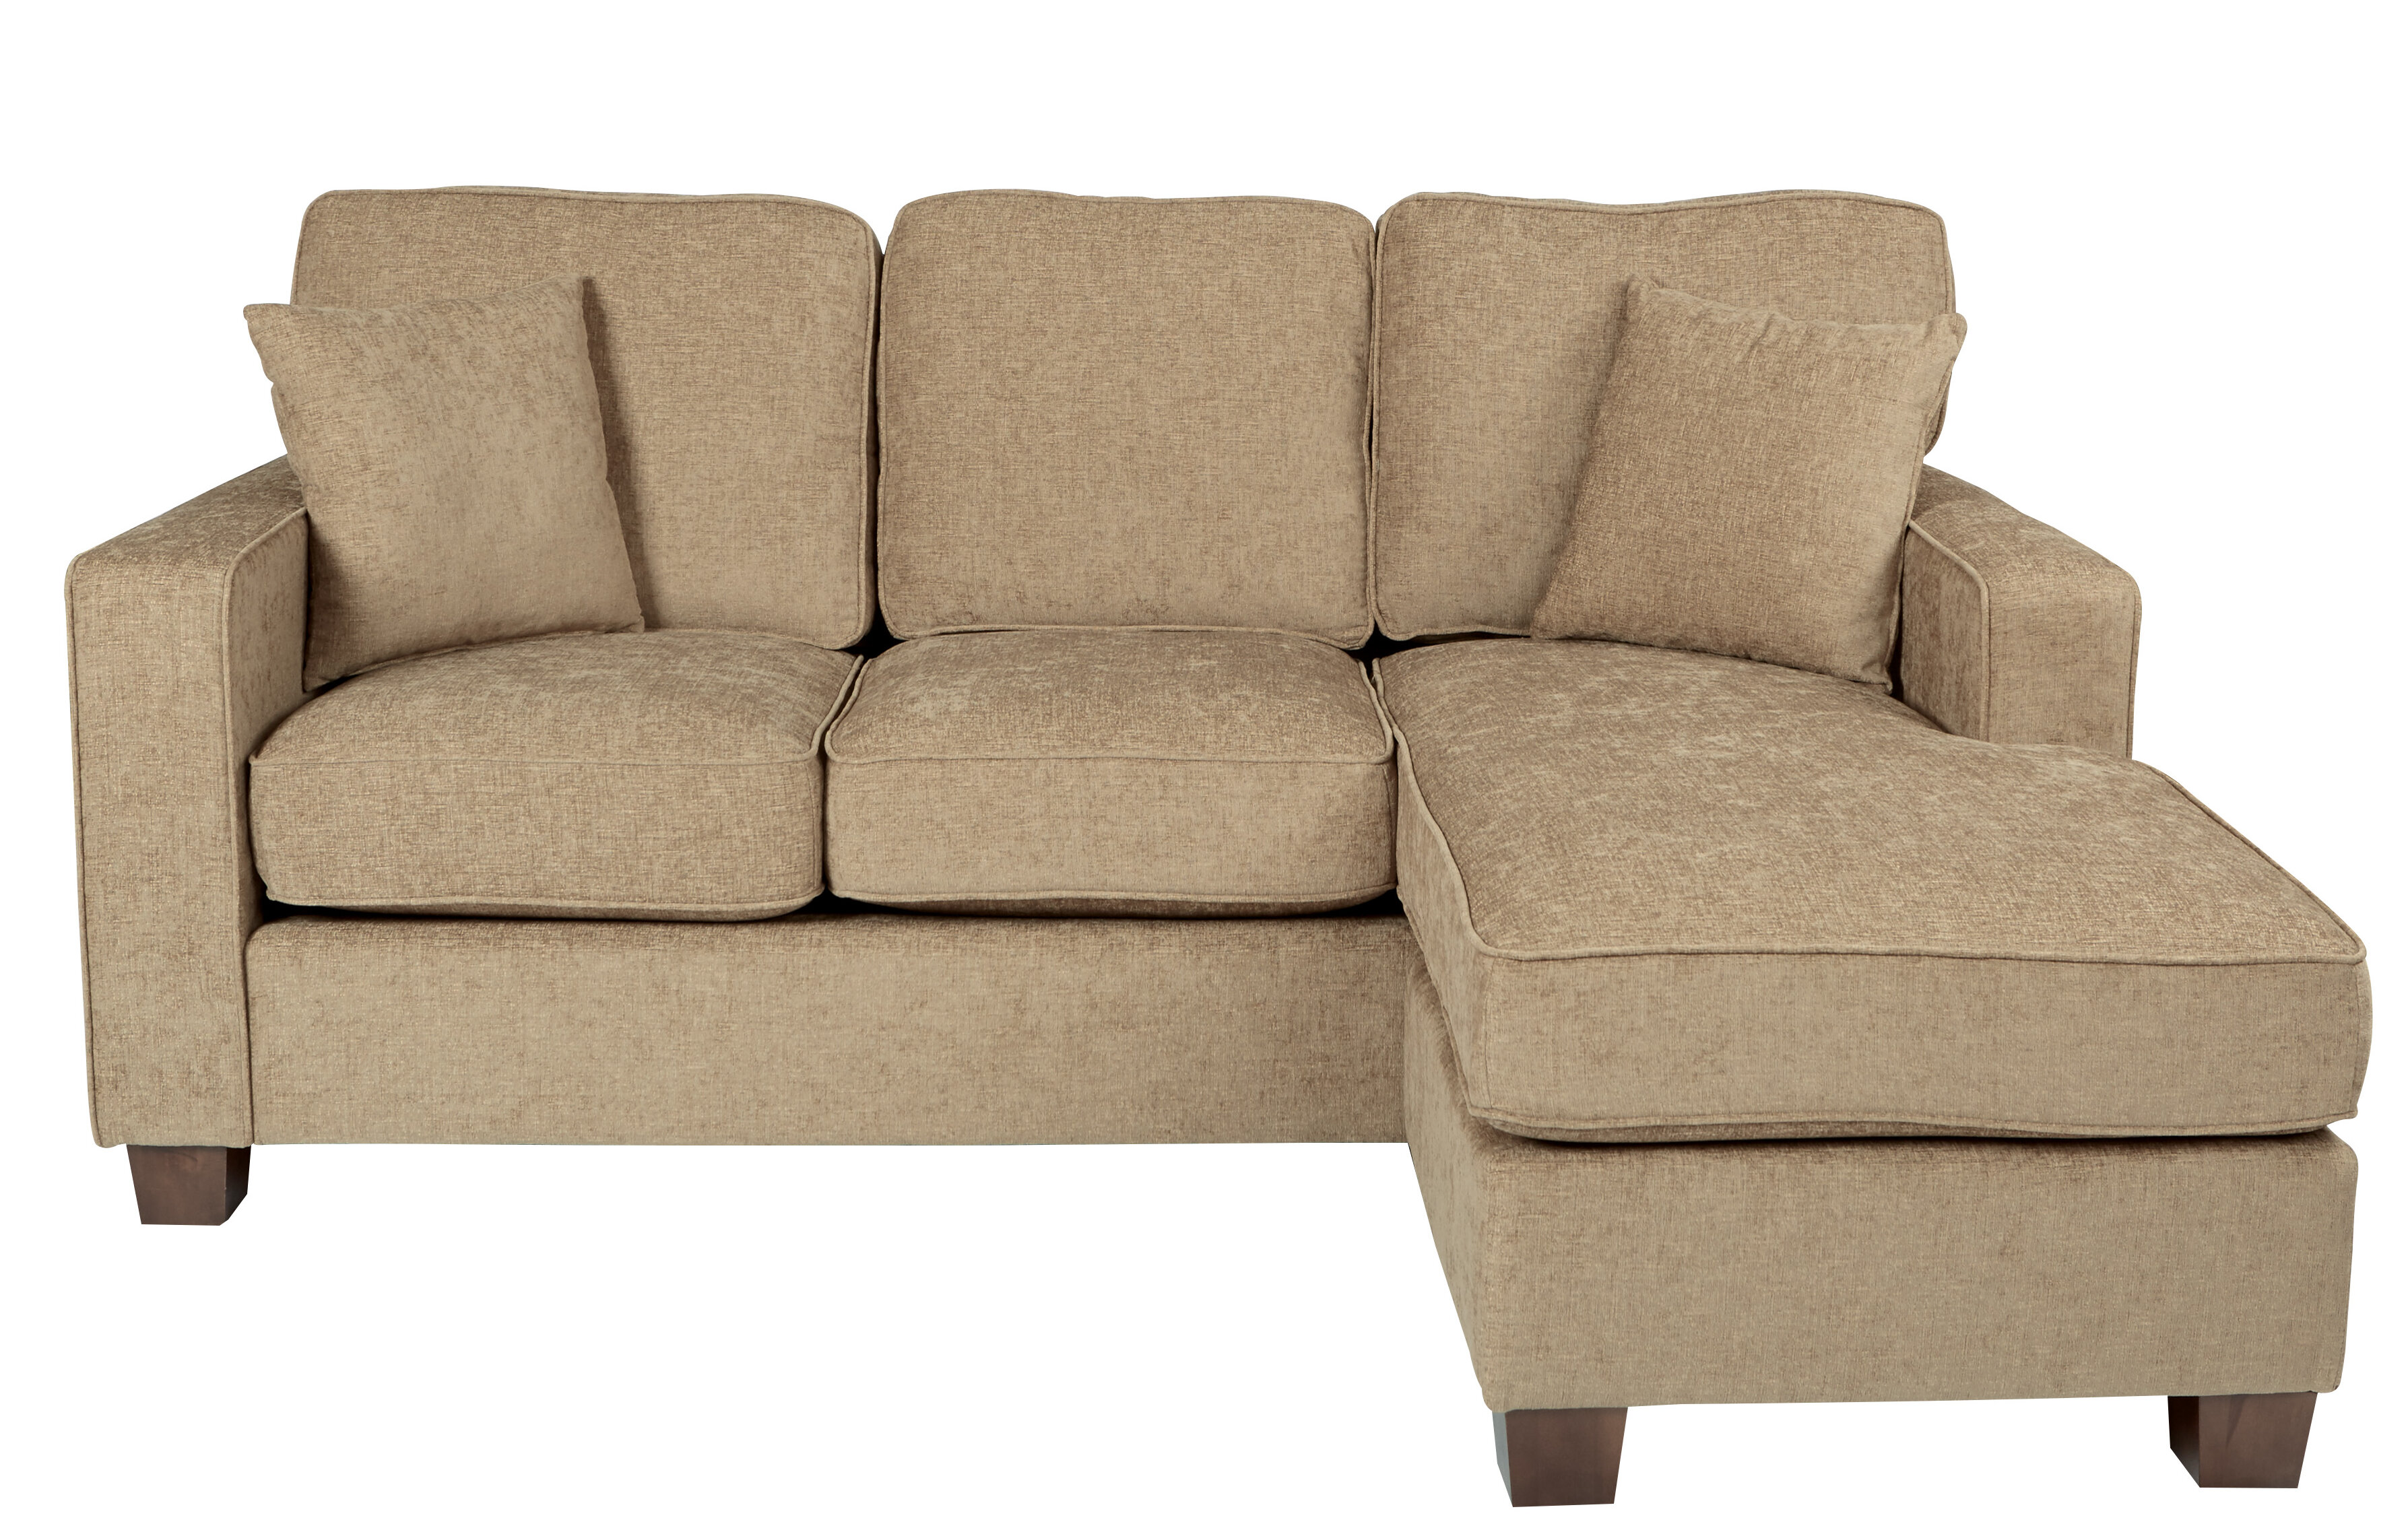 Swell Kehlani Reversible Sectional Spiritservingveterans Wood Chair Design Ideas Spiritservingveteransorg